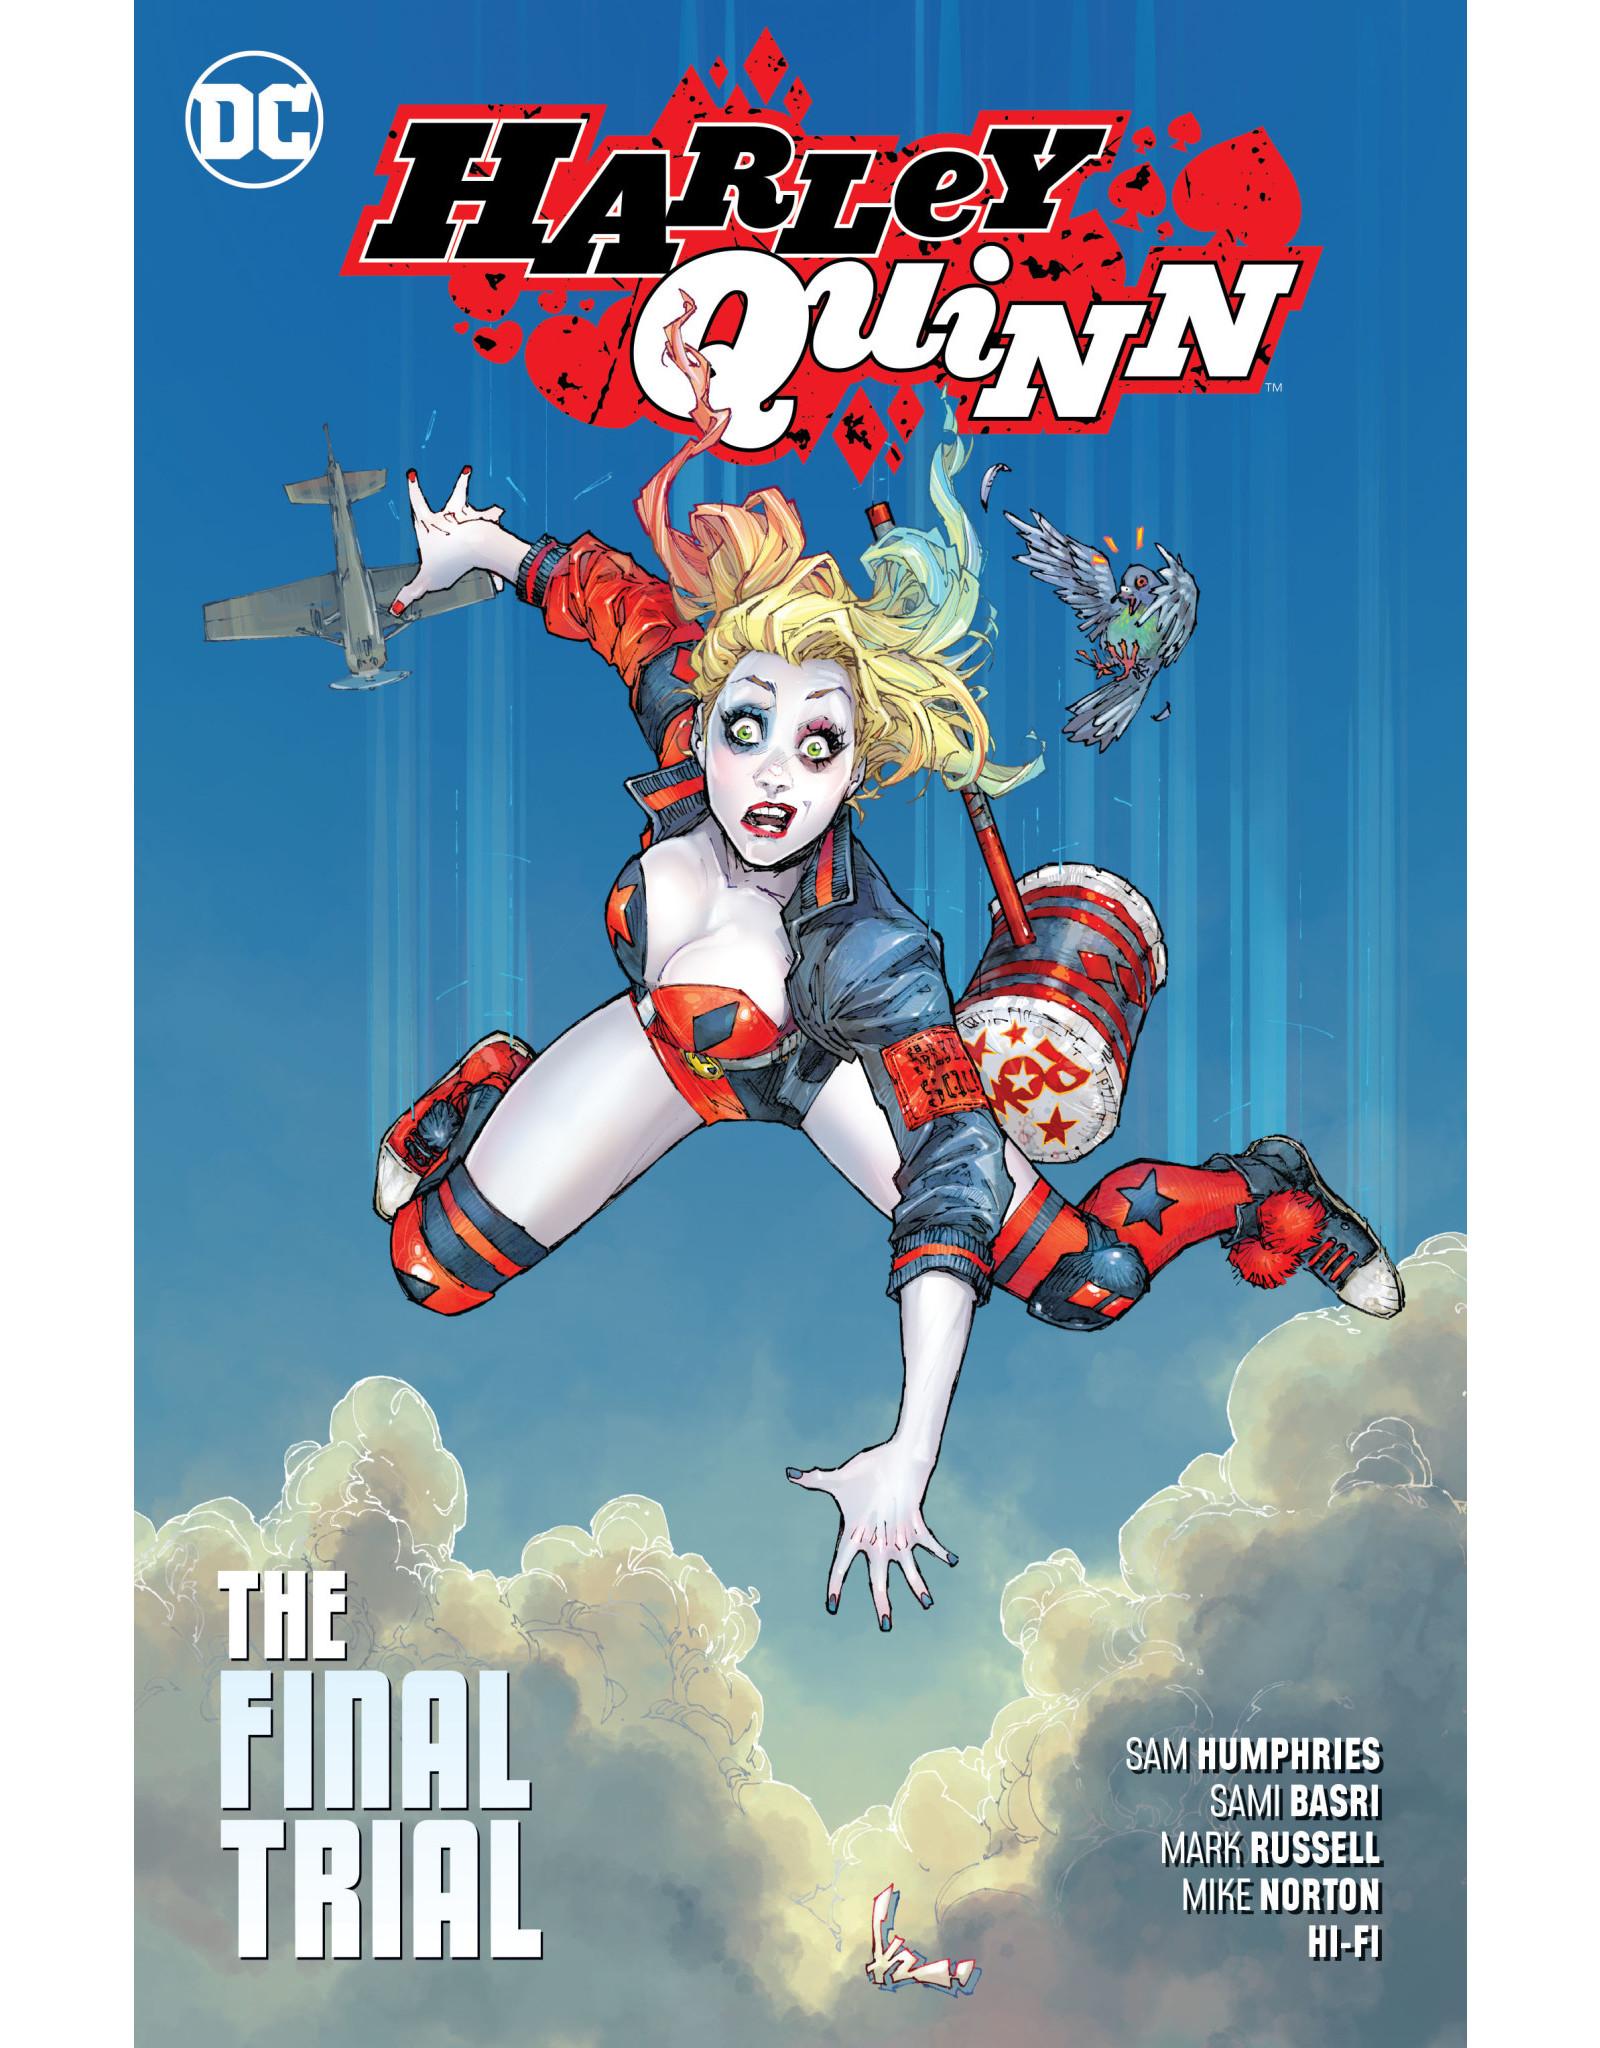 DC COMICS HARLEY QUINN TP VOL 04 THE FINAL TRIAL